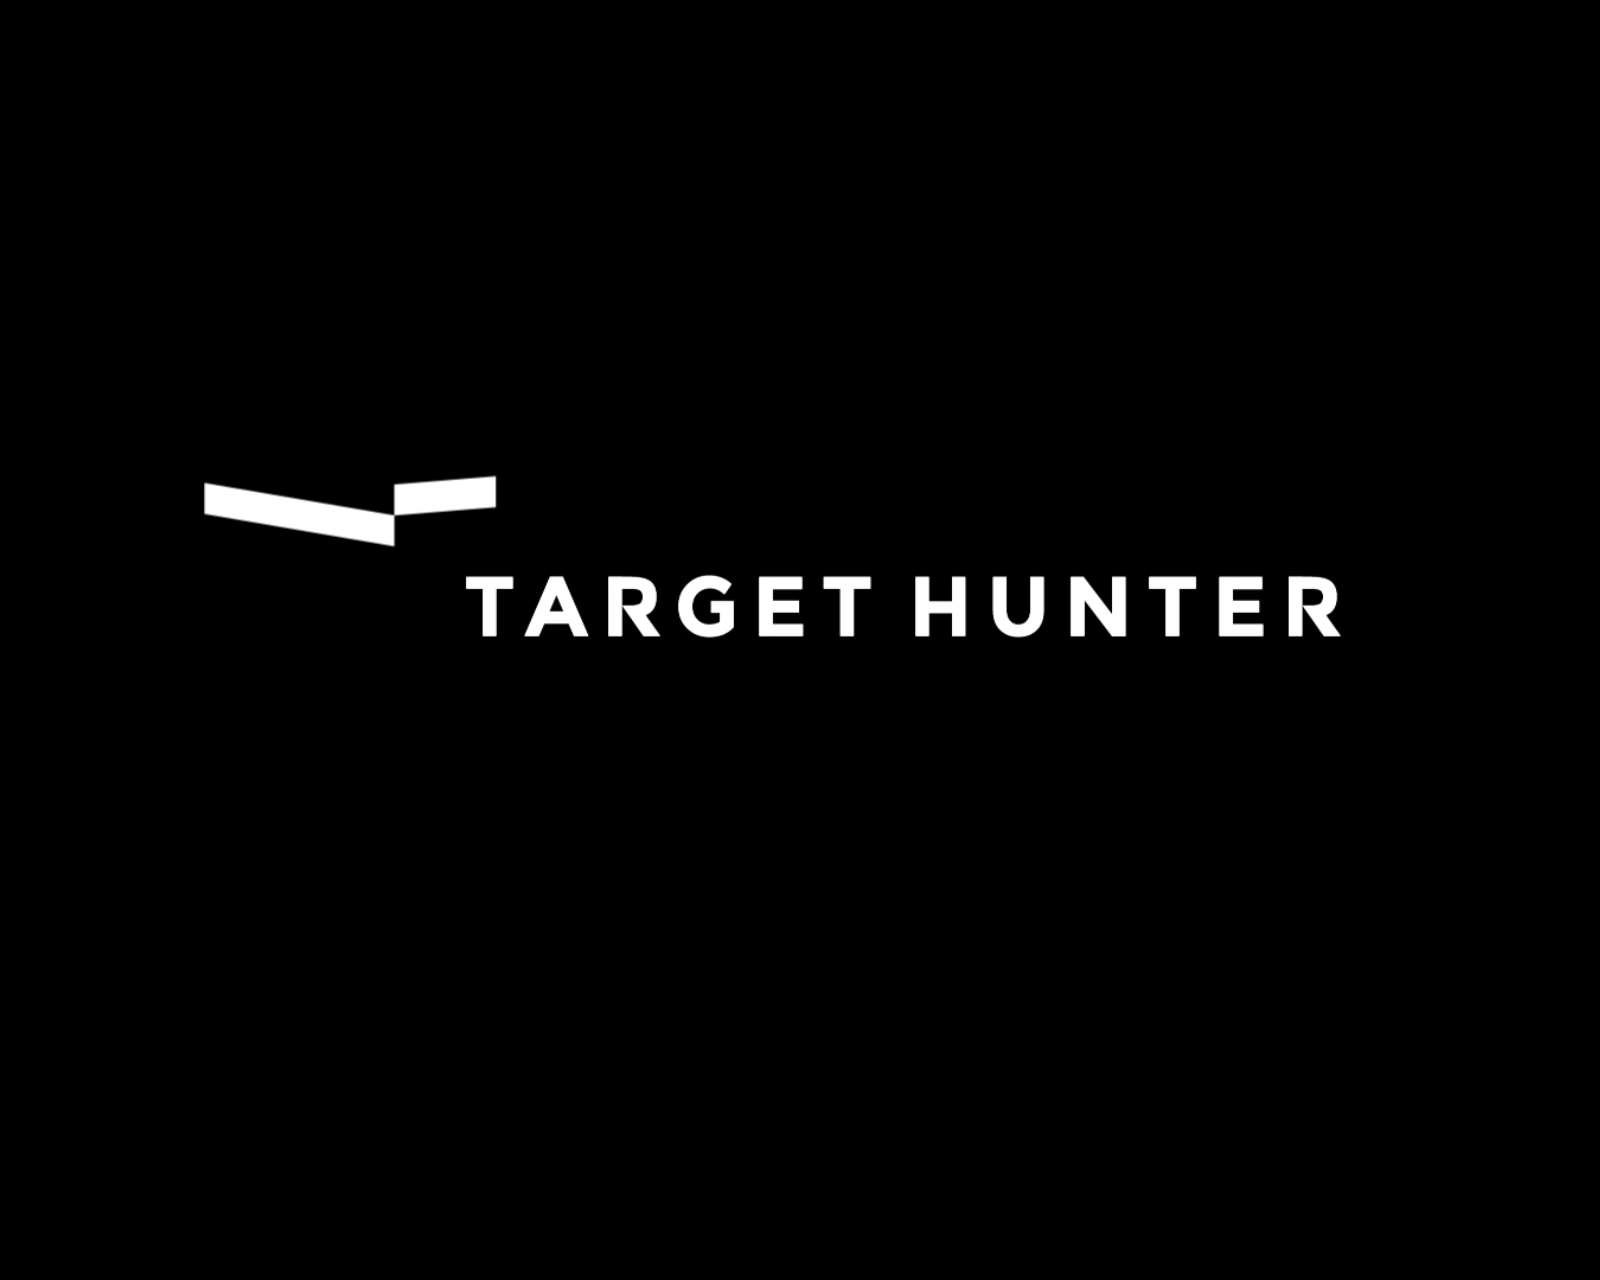 Target Hunter Animated Logo